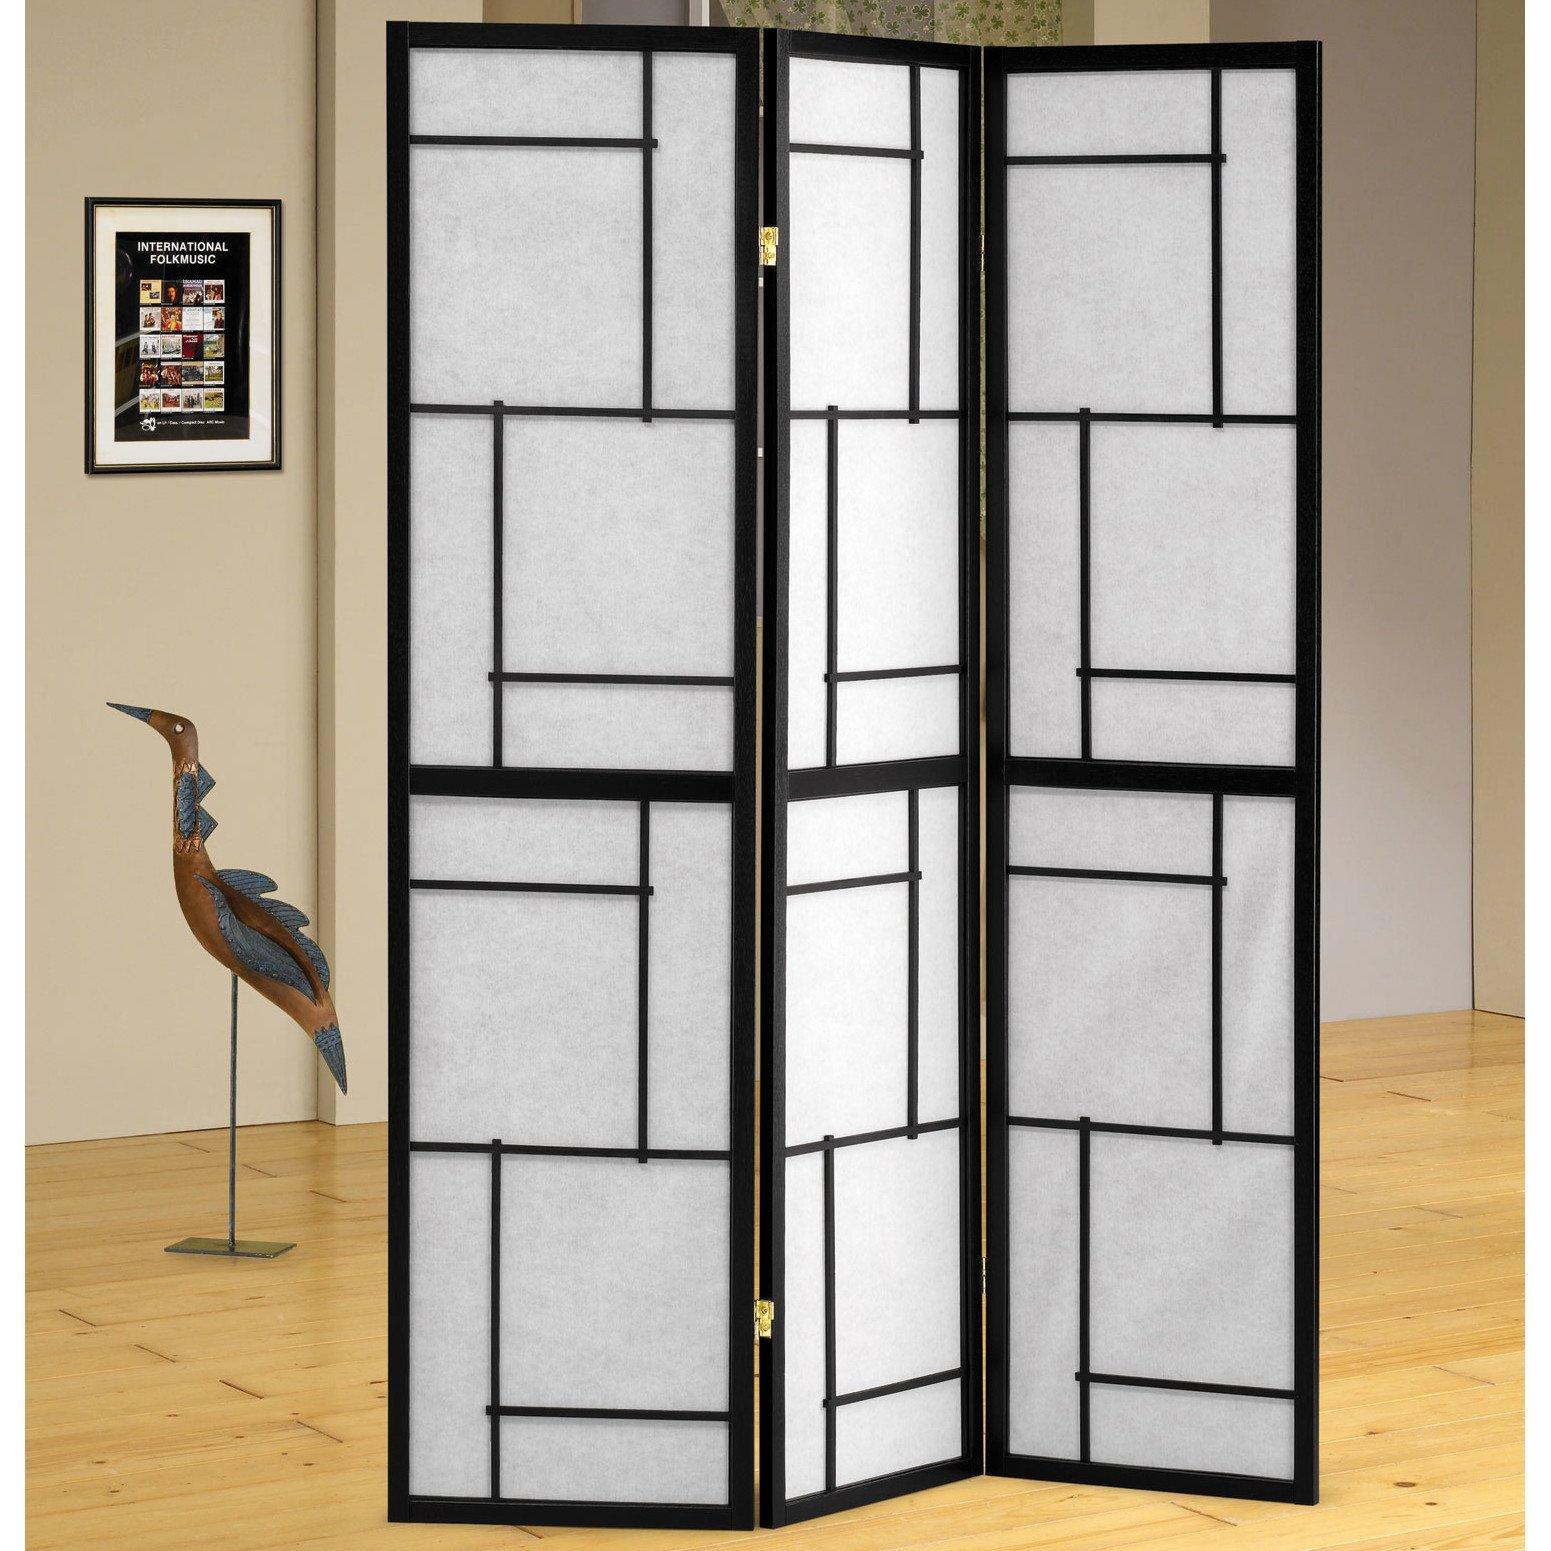 Sarai 3 Panel Folding Screens Room Divider in Black/White Finish 70.25'' H x 54'' W x 0.75'' D in.